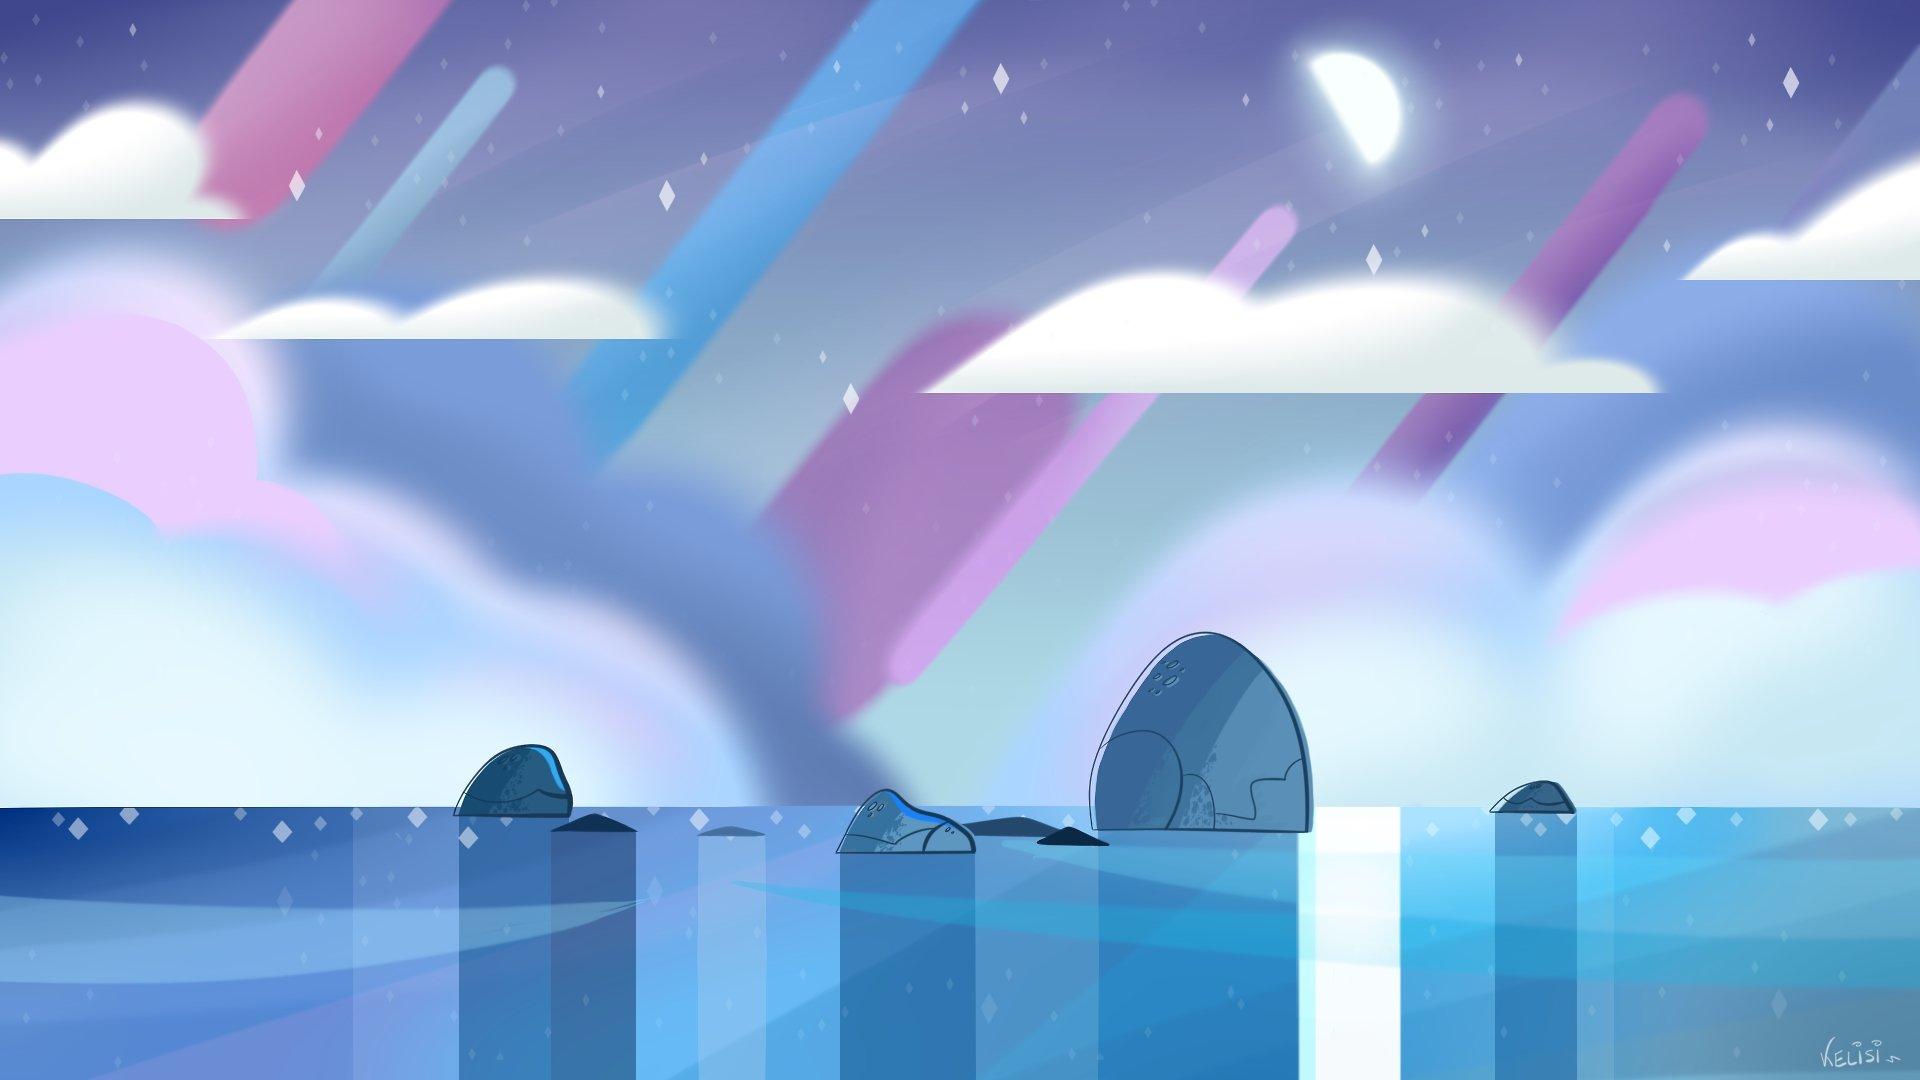 Steven Universe Wallpaper Pic